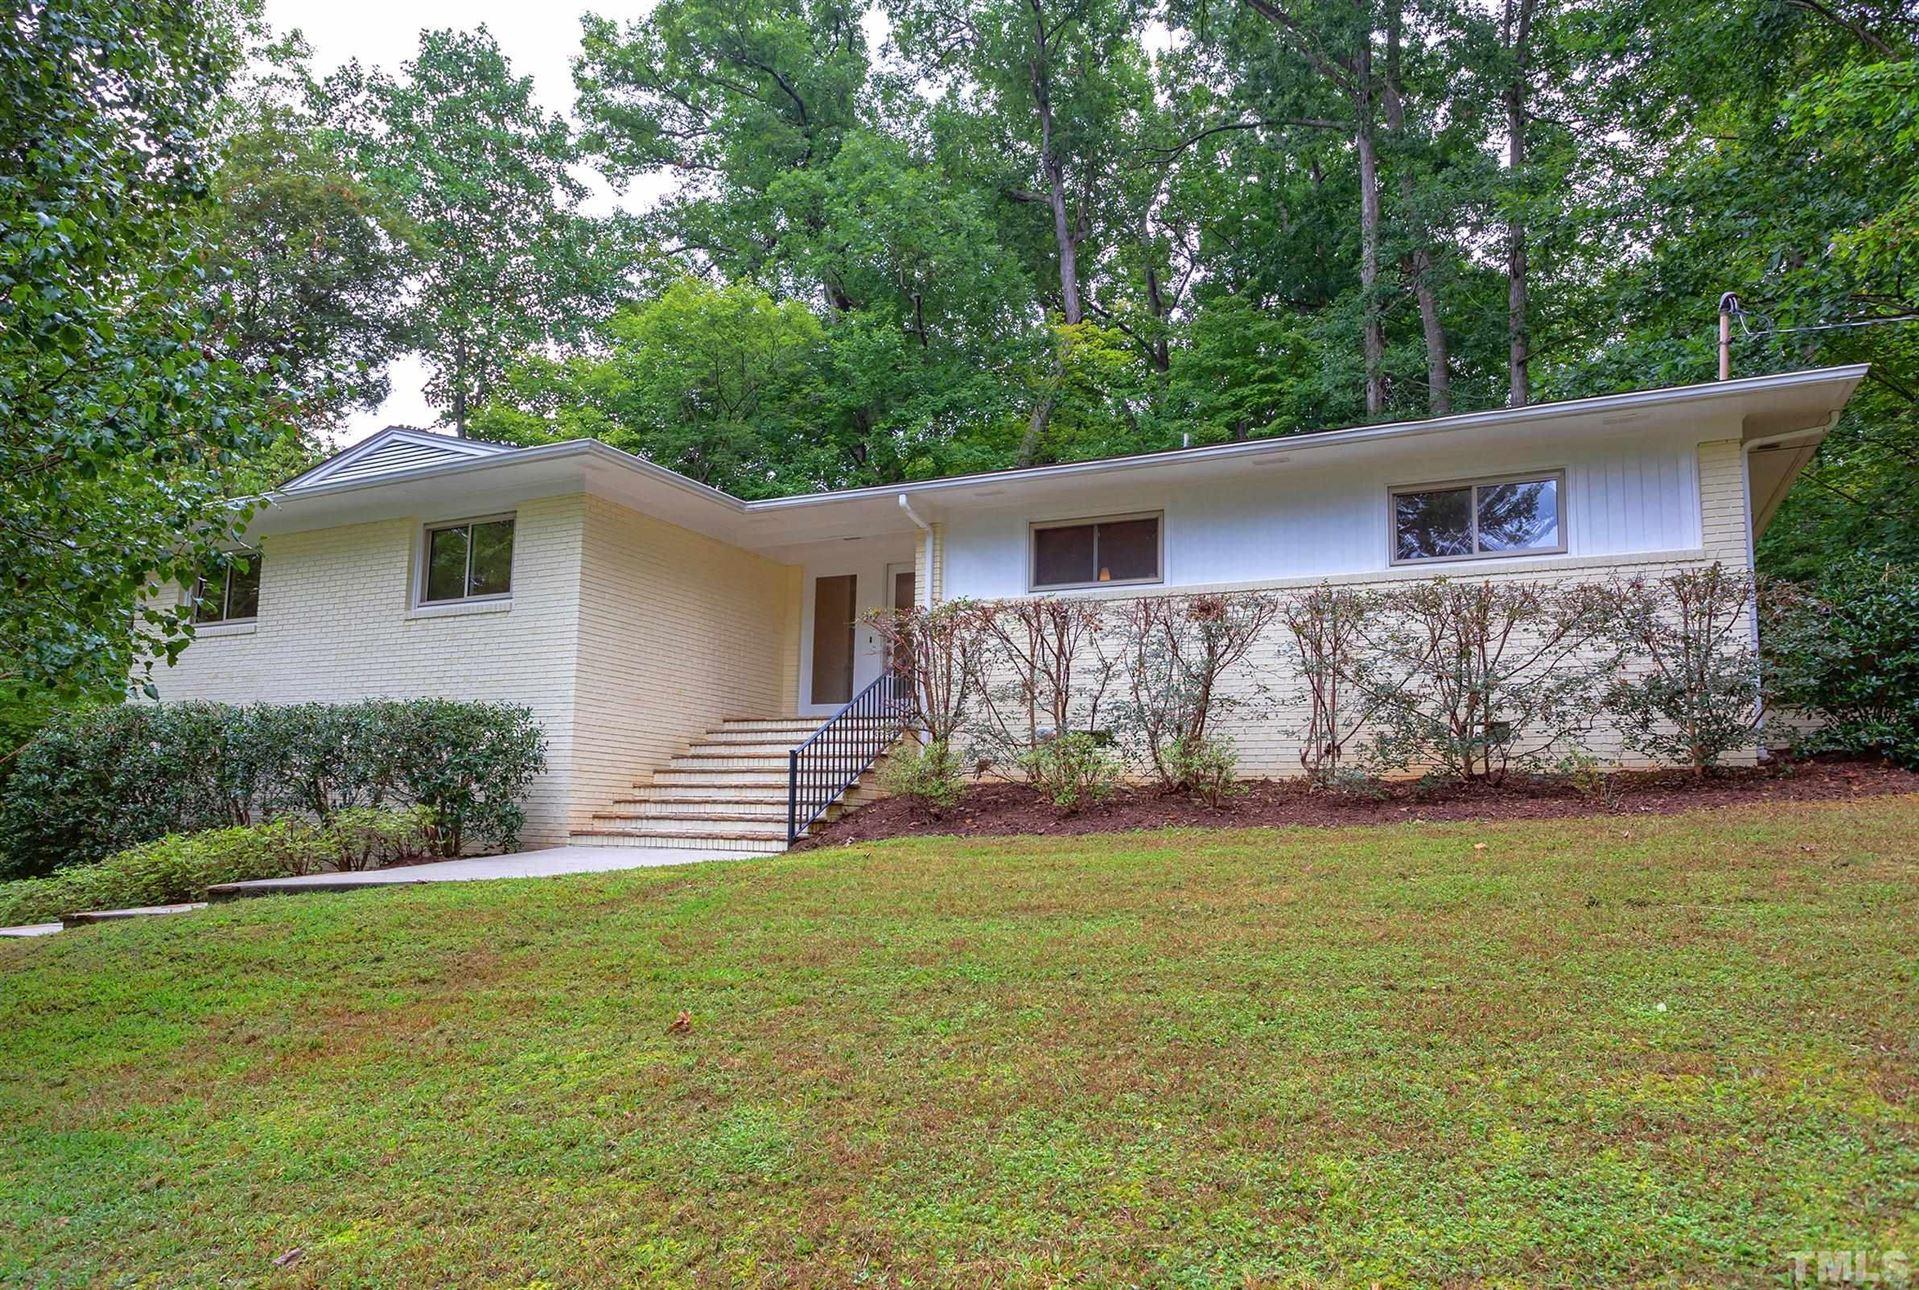 Photo of 912 Winona Road, Raleigh, NC 27609 (MLS # 2408635)